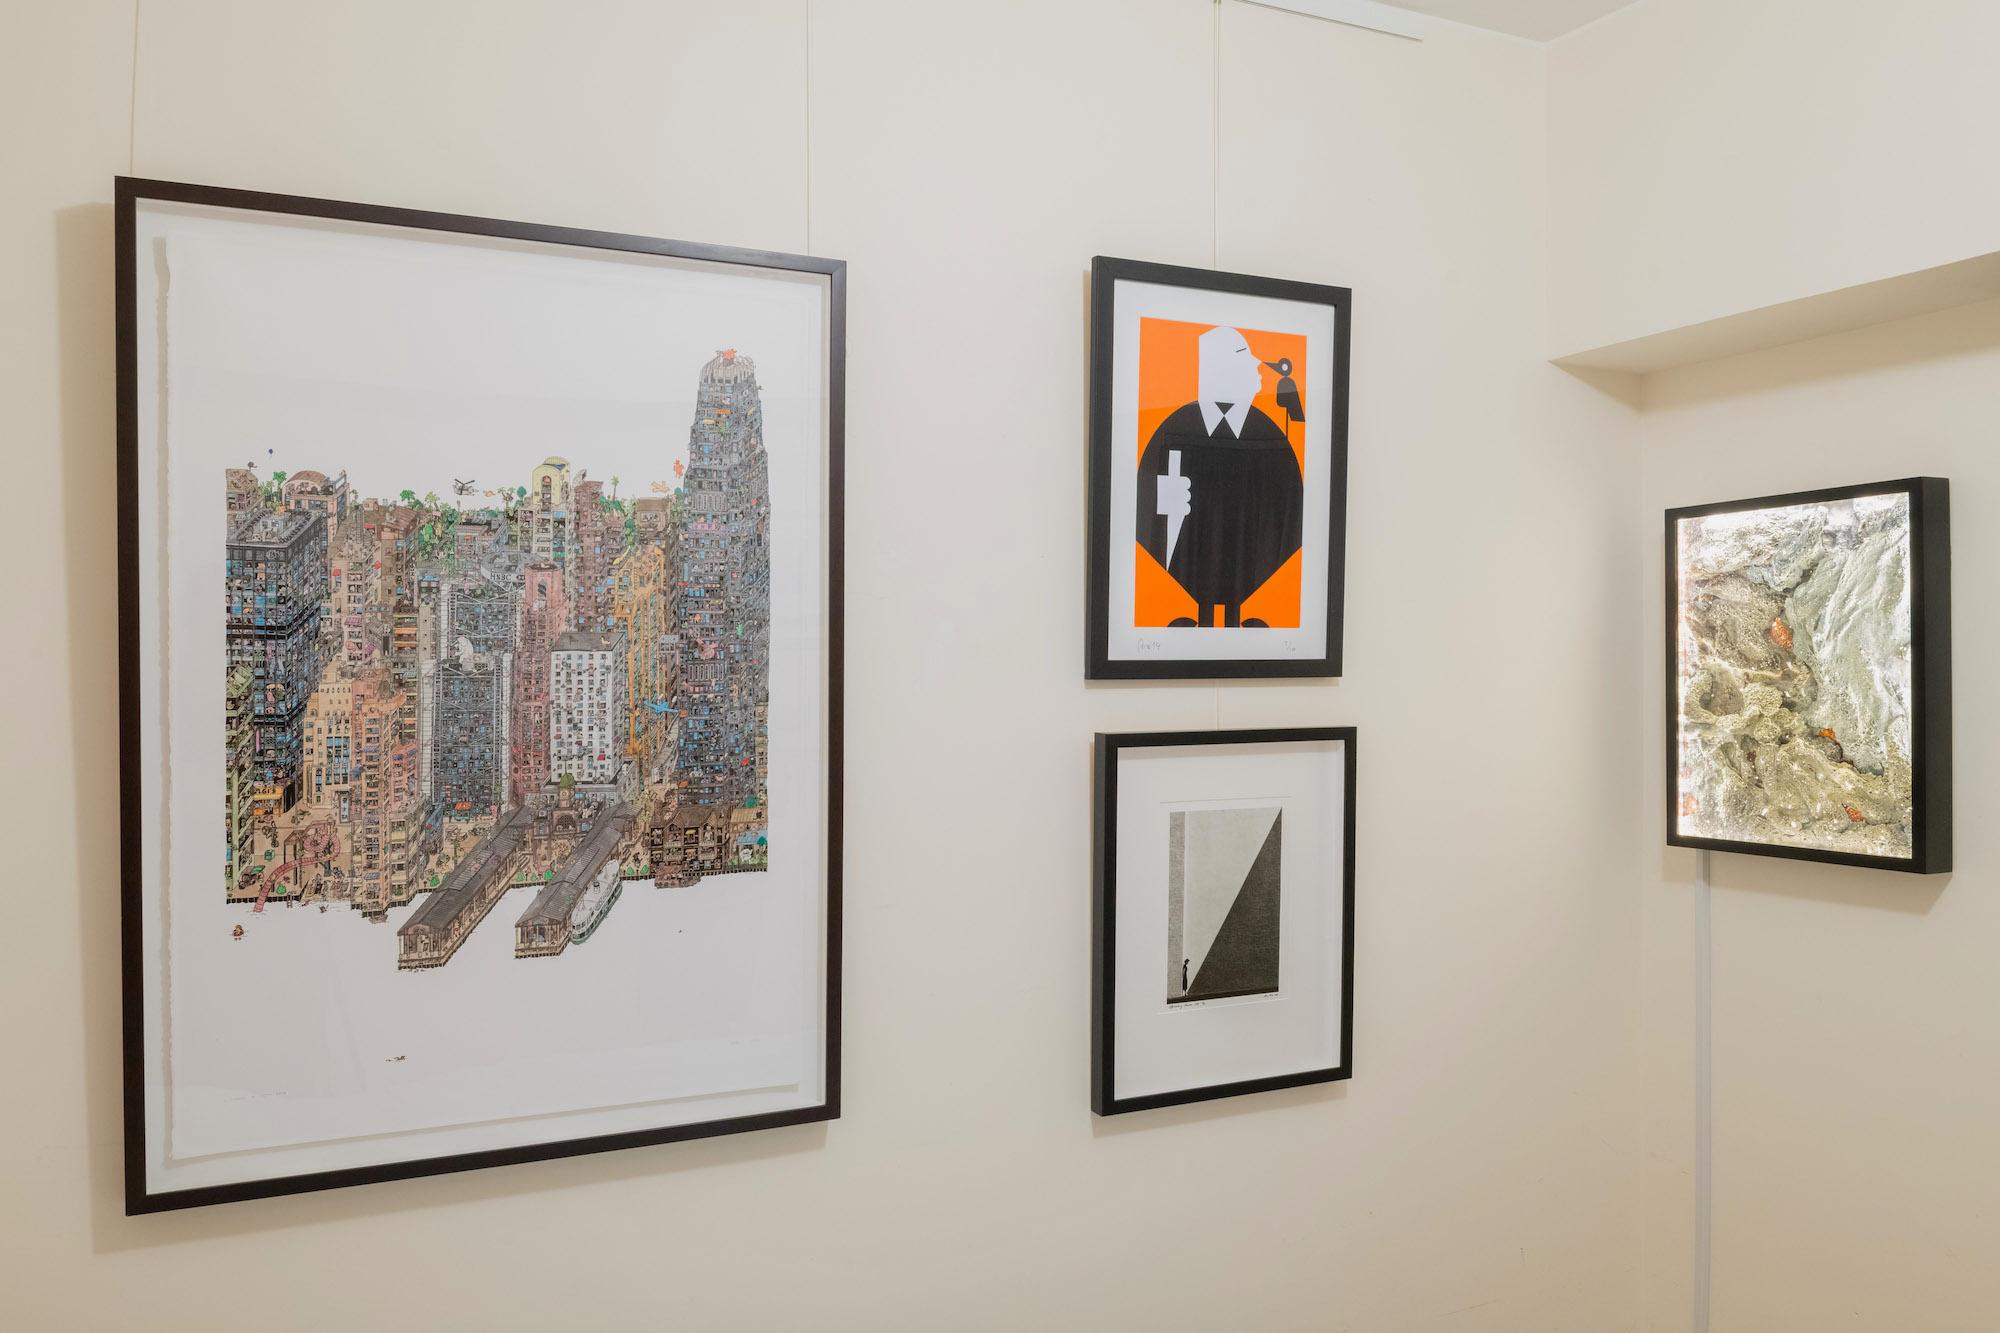 Clockwise from left, Guillaume Cornet, Rex Koo, Andrew Luk and Fan Ho in the bedroom. Courtesy of Yuri van der Leest.